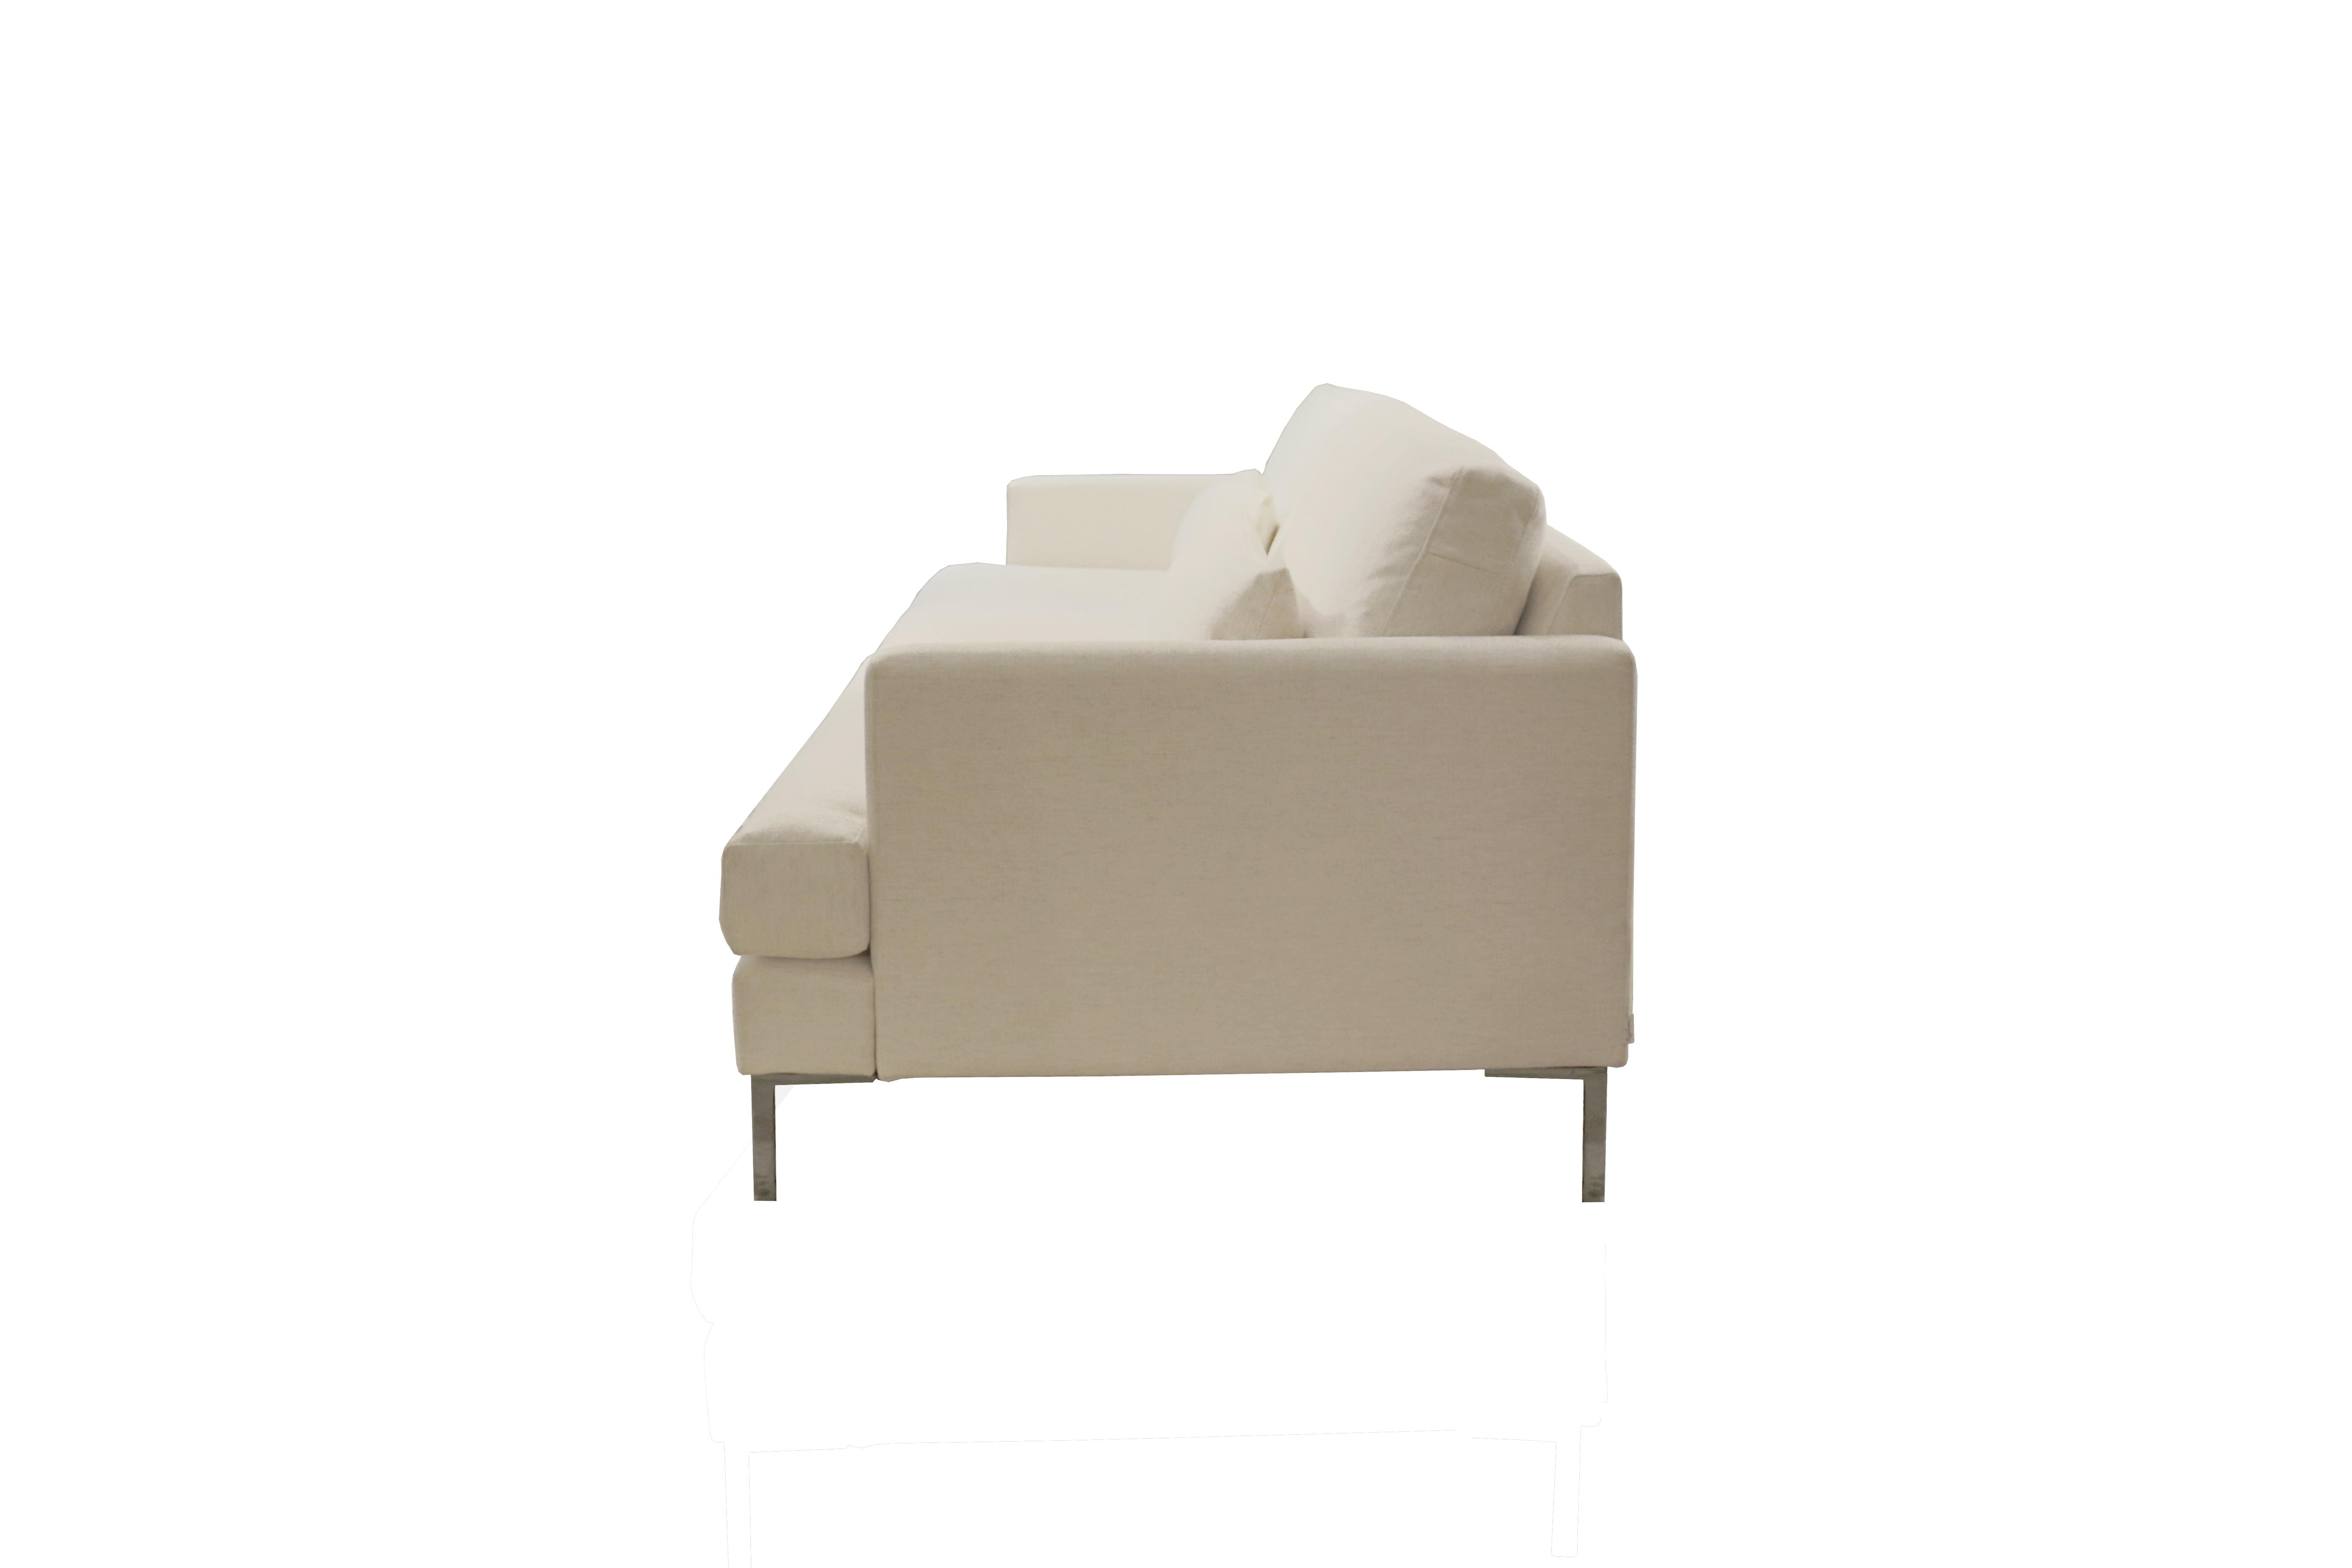 Mind soffa 3,5-sits från sidan - englesson.se